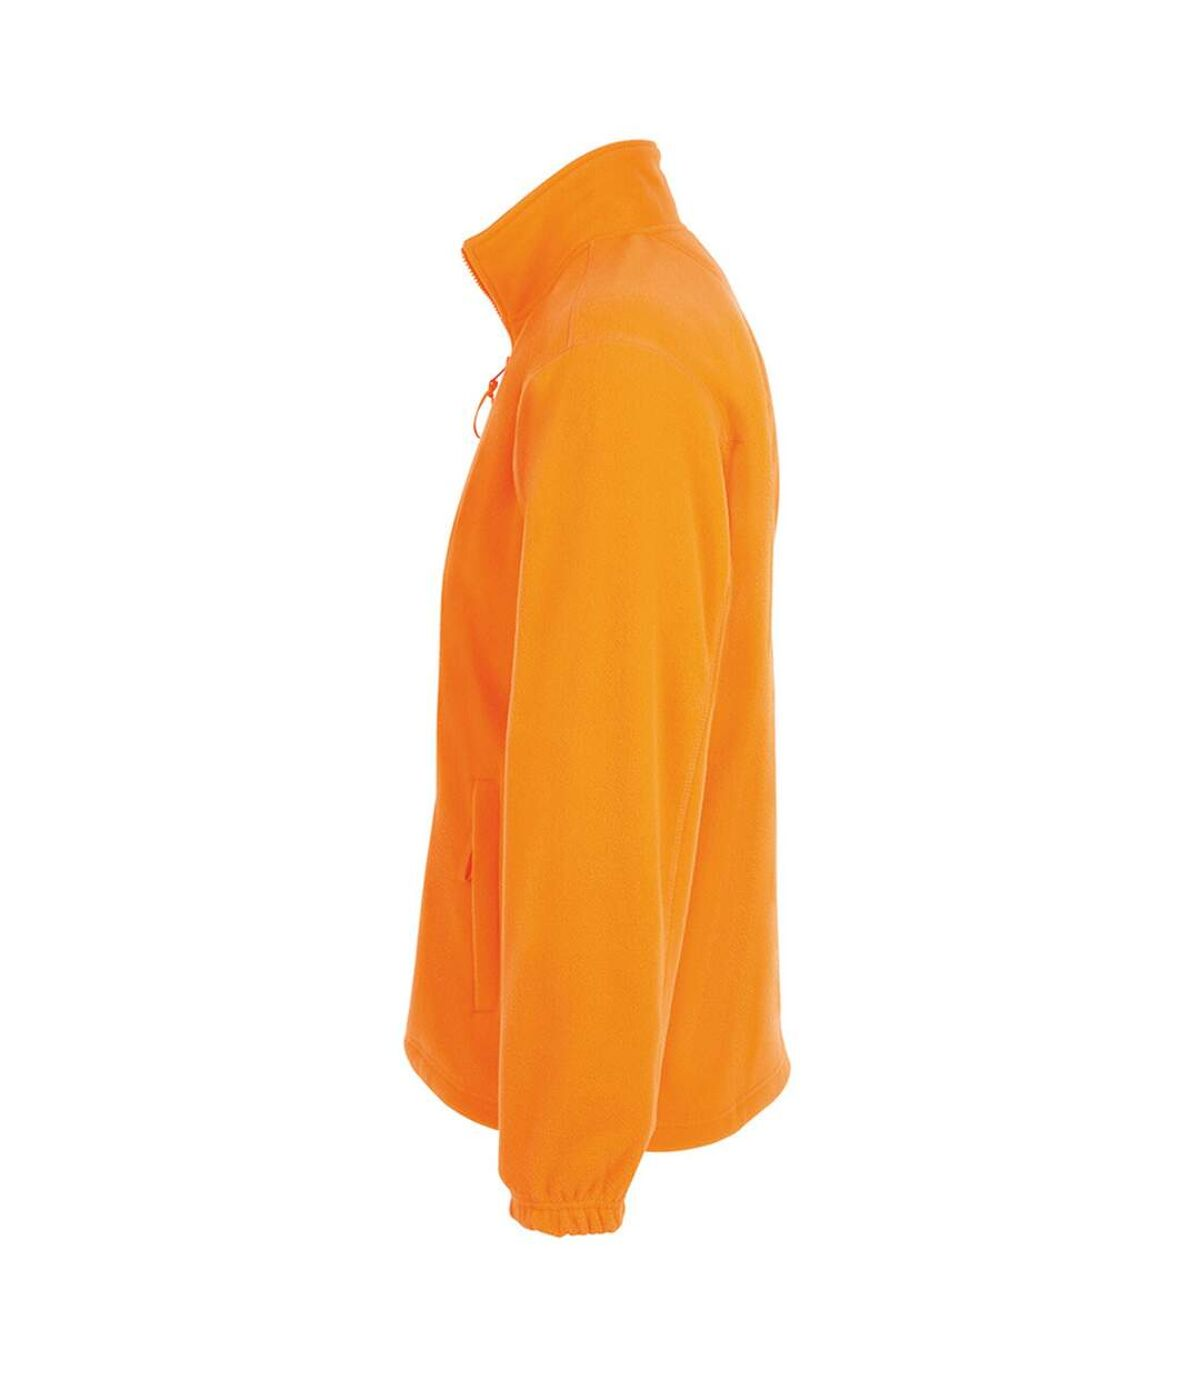 SOLS - Veste polaire NORTH - Homme (Orange néon) - UTPC343